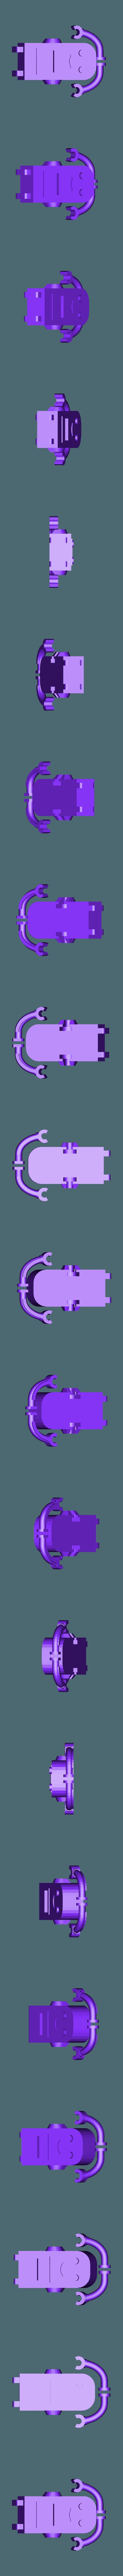 girl.stl Download free STL file Robot Family Simple No Support • 3D printable design, Toymakr3D